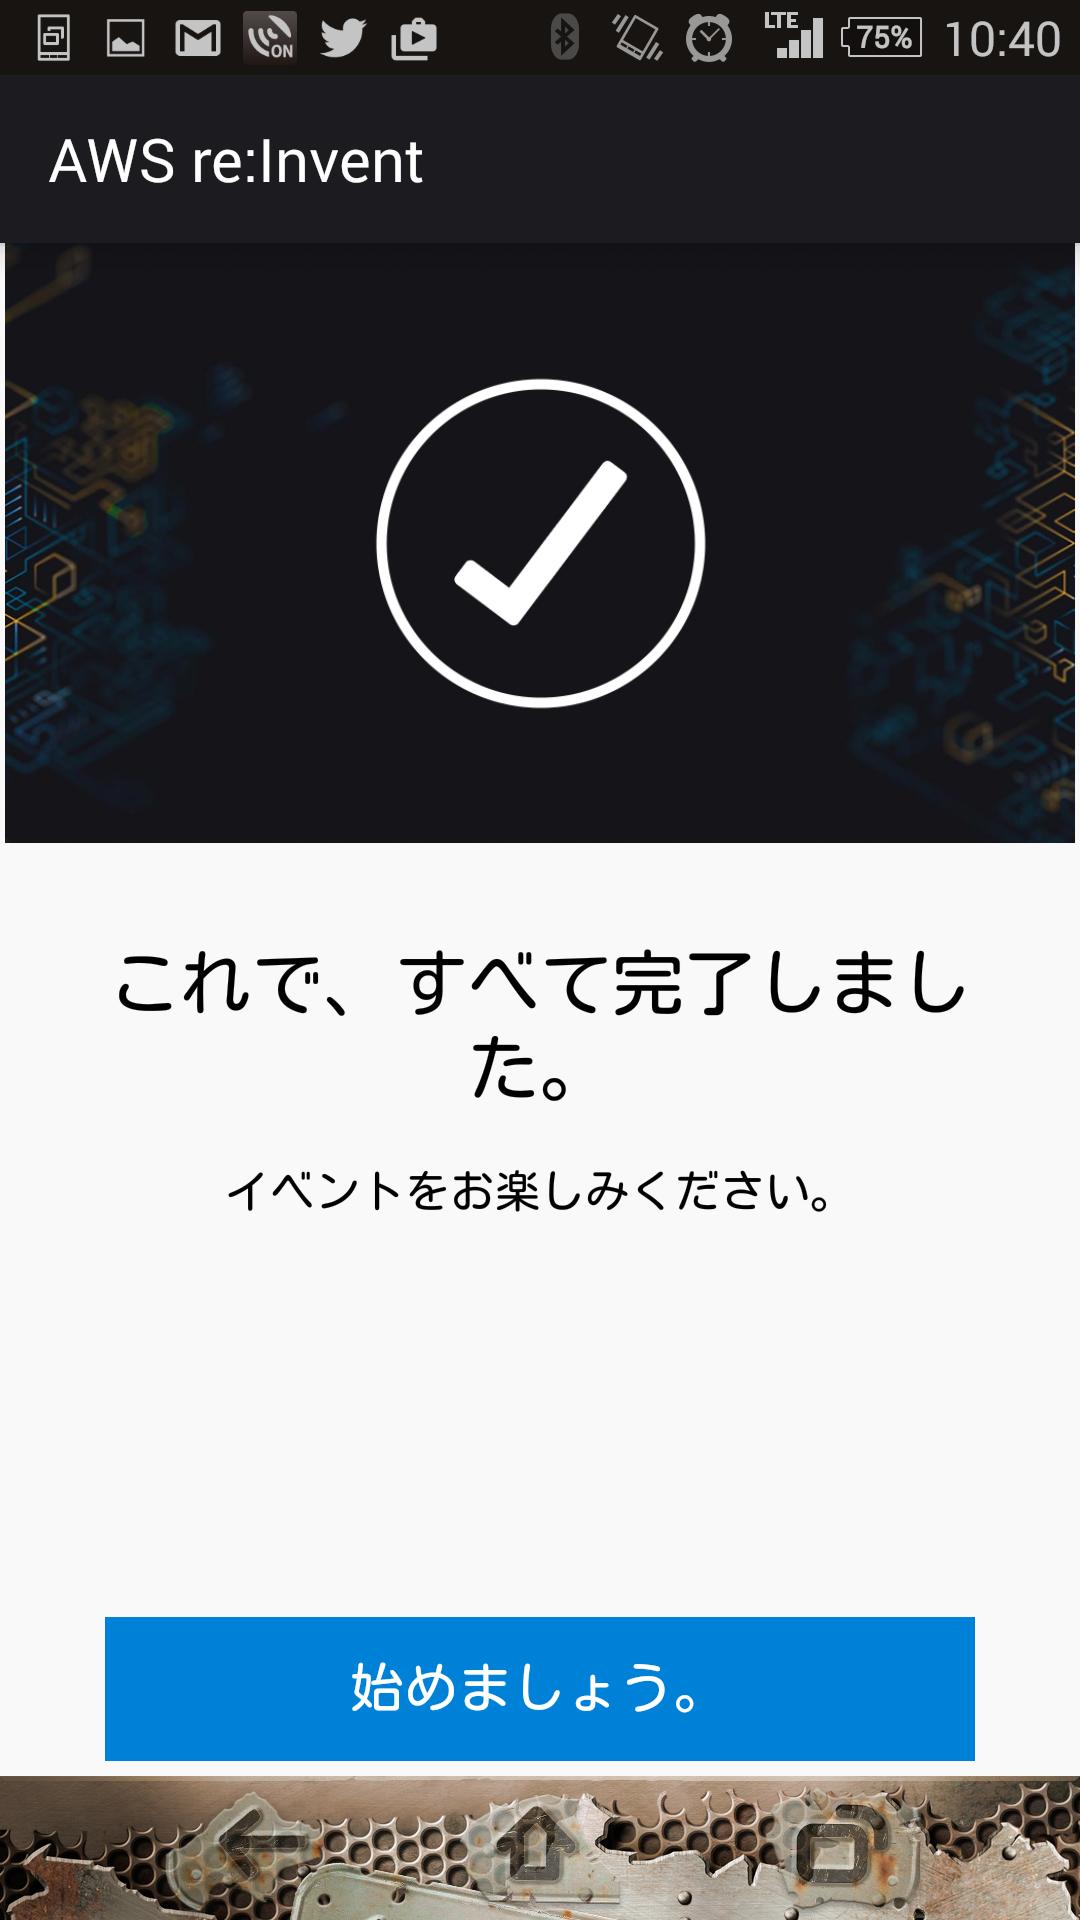 aws-reinvent-2015-event-app_05